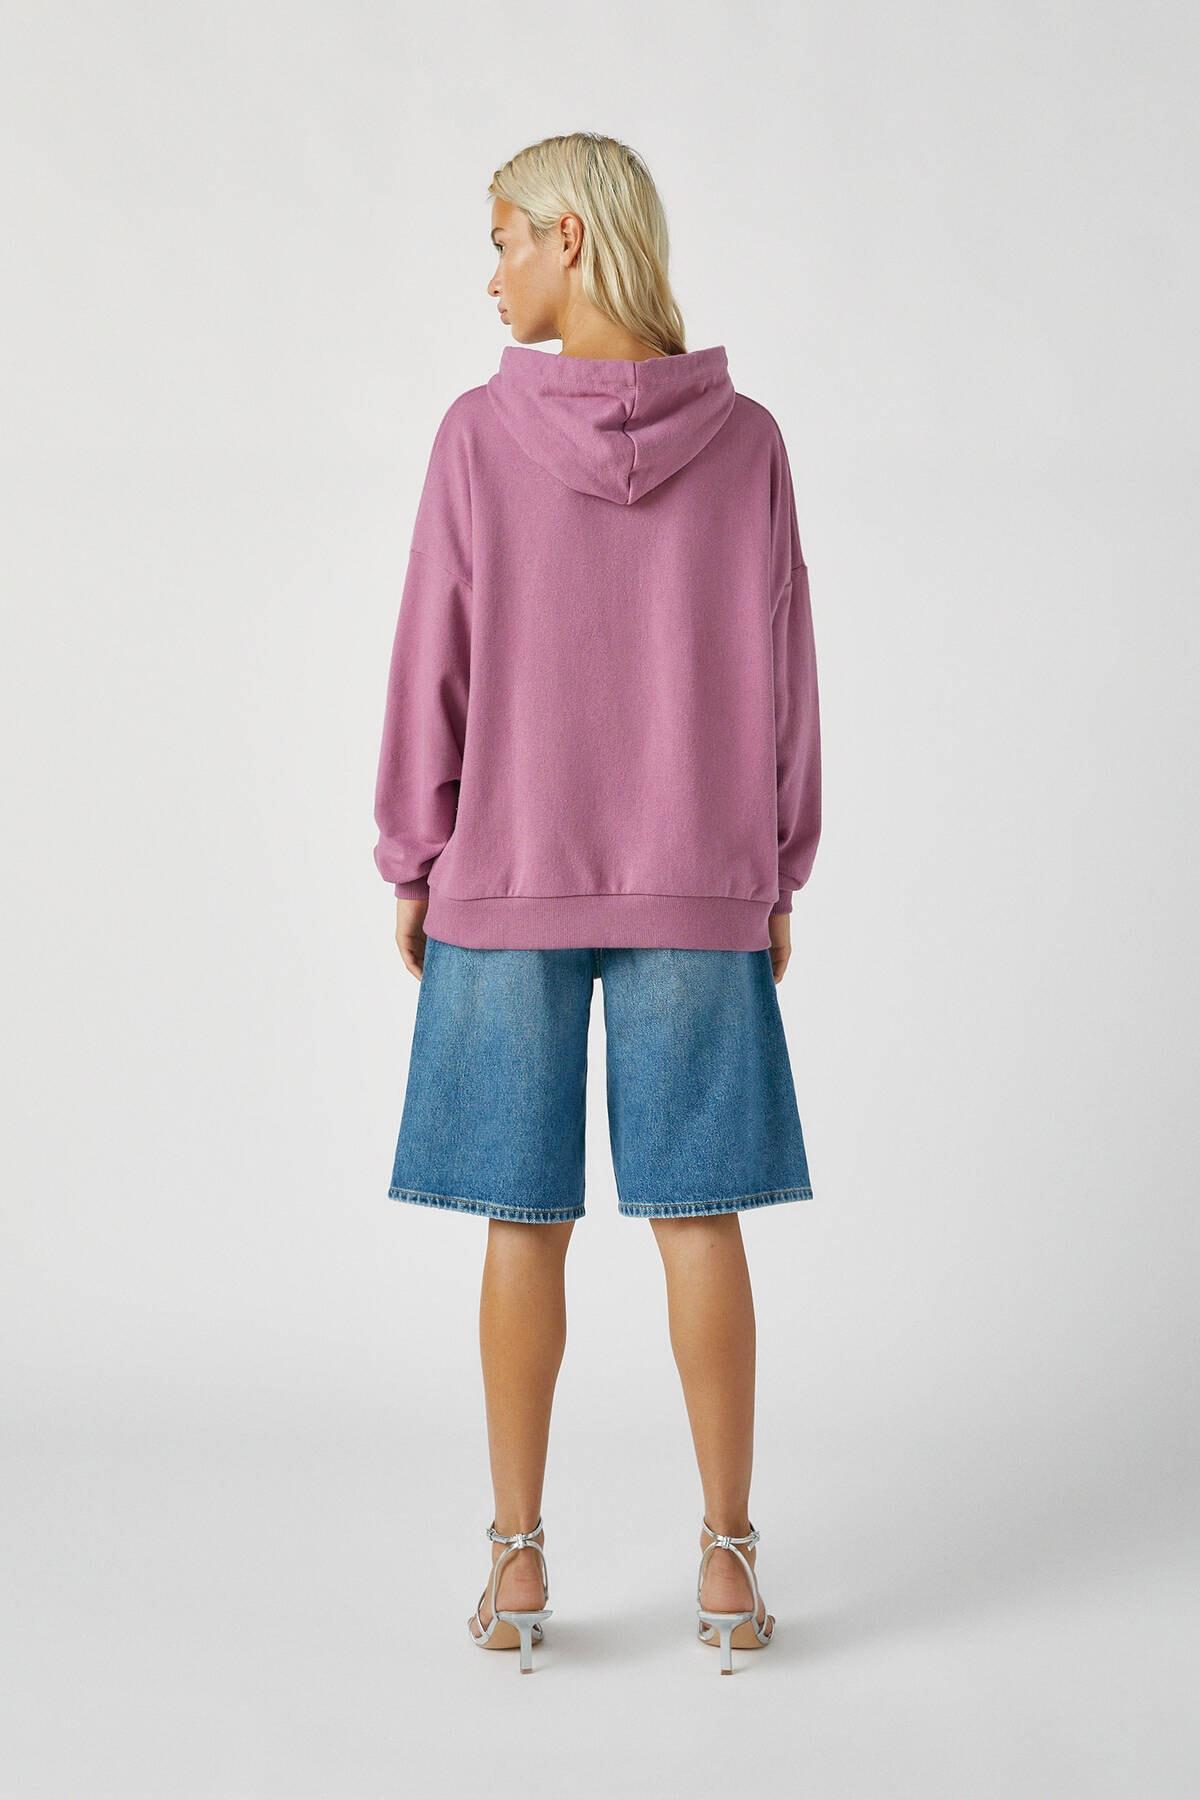 Pull & Bear Kadın Mor Renkli Kapüşonlu Sweatshirt 09594312 2